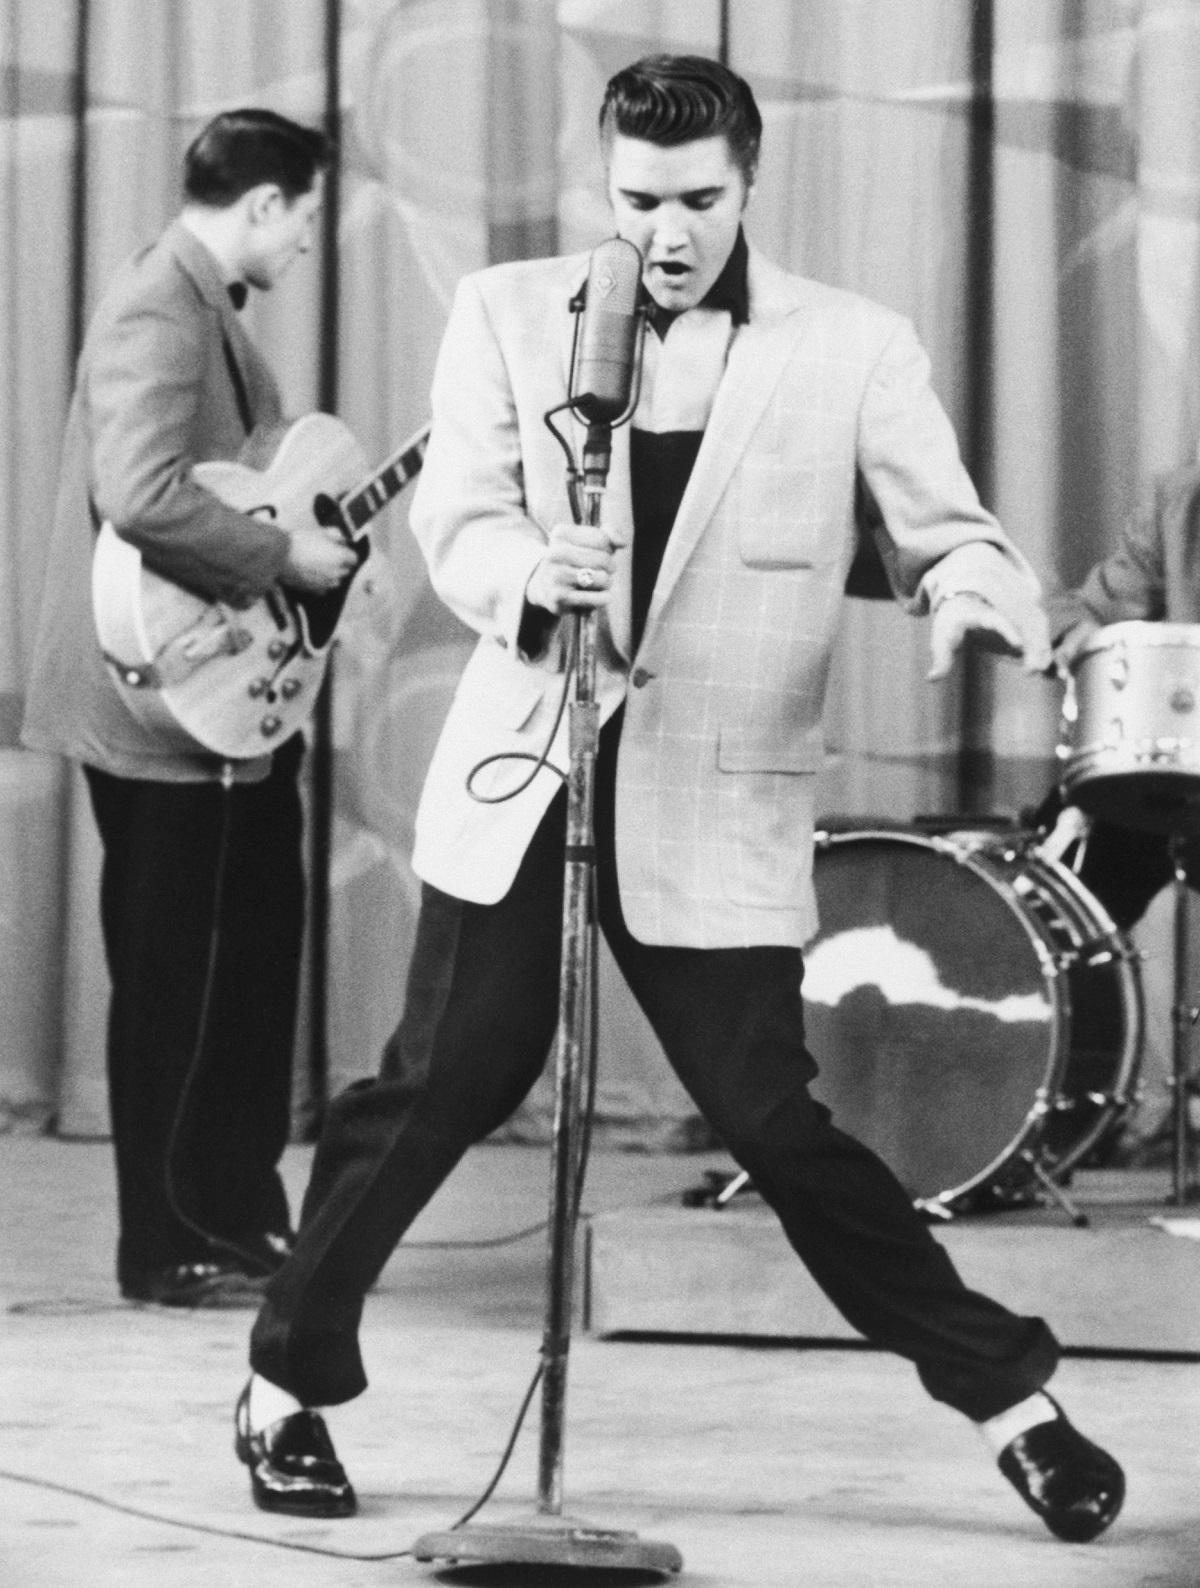 Black and white photo of Elvis Presley performing 'Hillbilly Heartbreak' in Hollywood